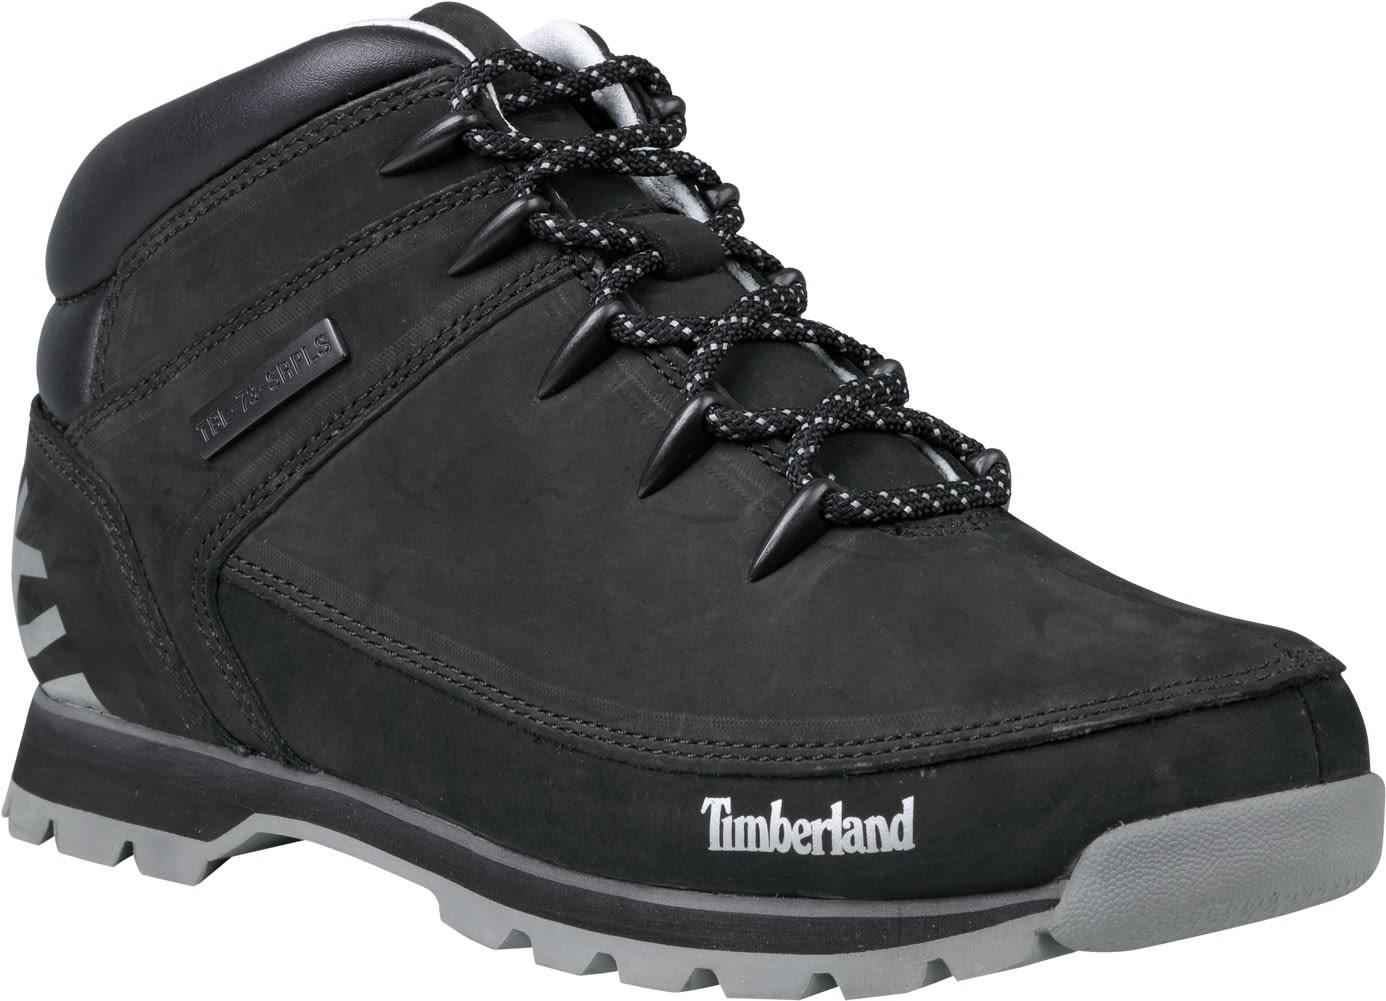 Timberland M Euro Sprint Hiker | Größe US 12 / EU 46 / UK 11.5,US 13 / EU 47.5